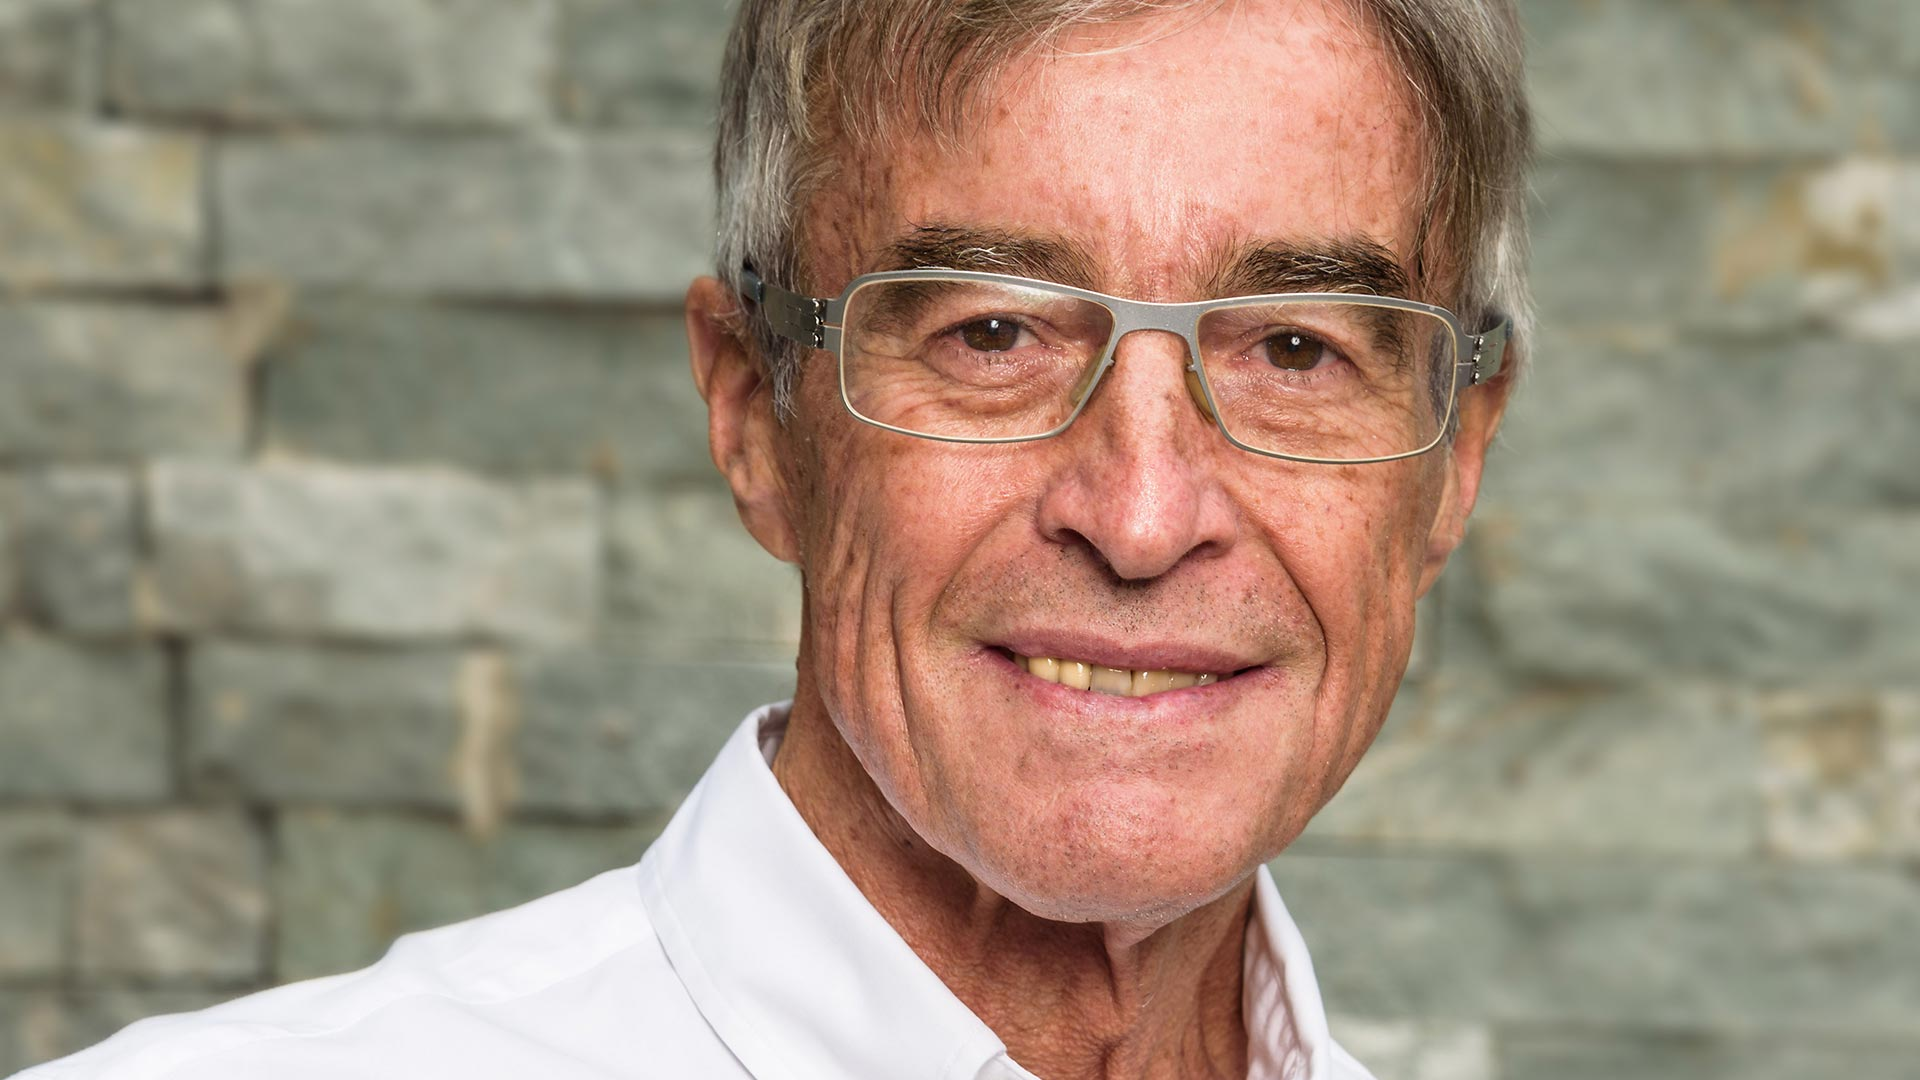 Dr. Mario San Nicolo